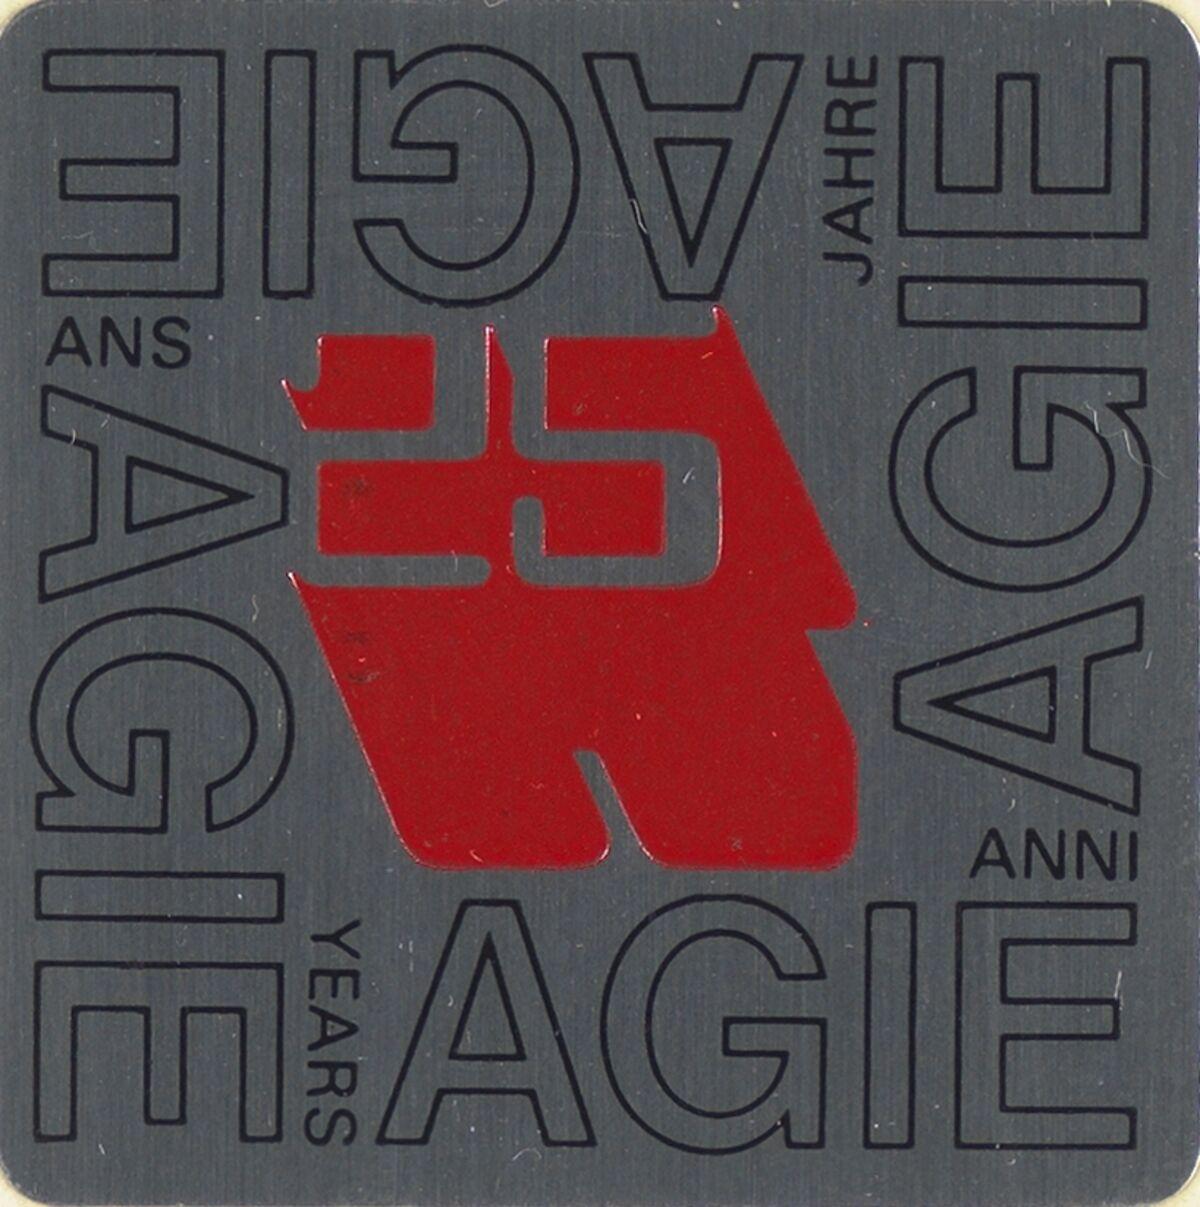 GFA 42/50127: Signet 25 years of AGIE